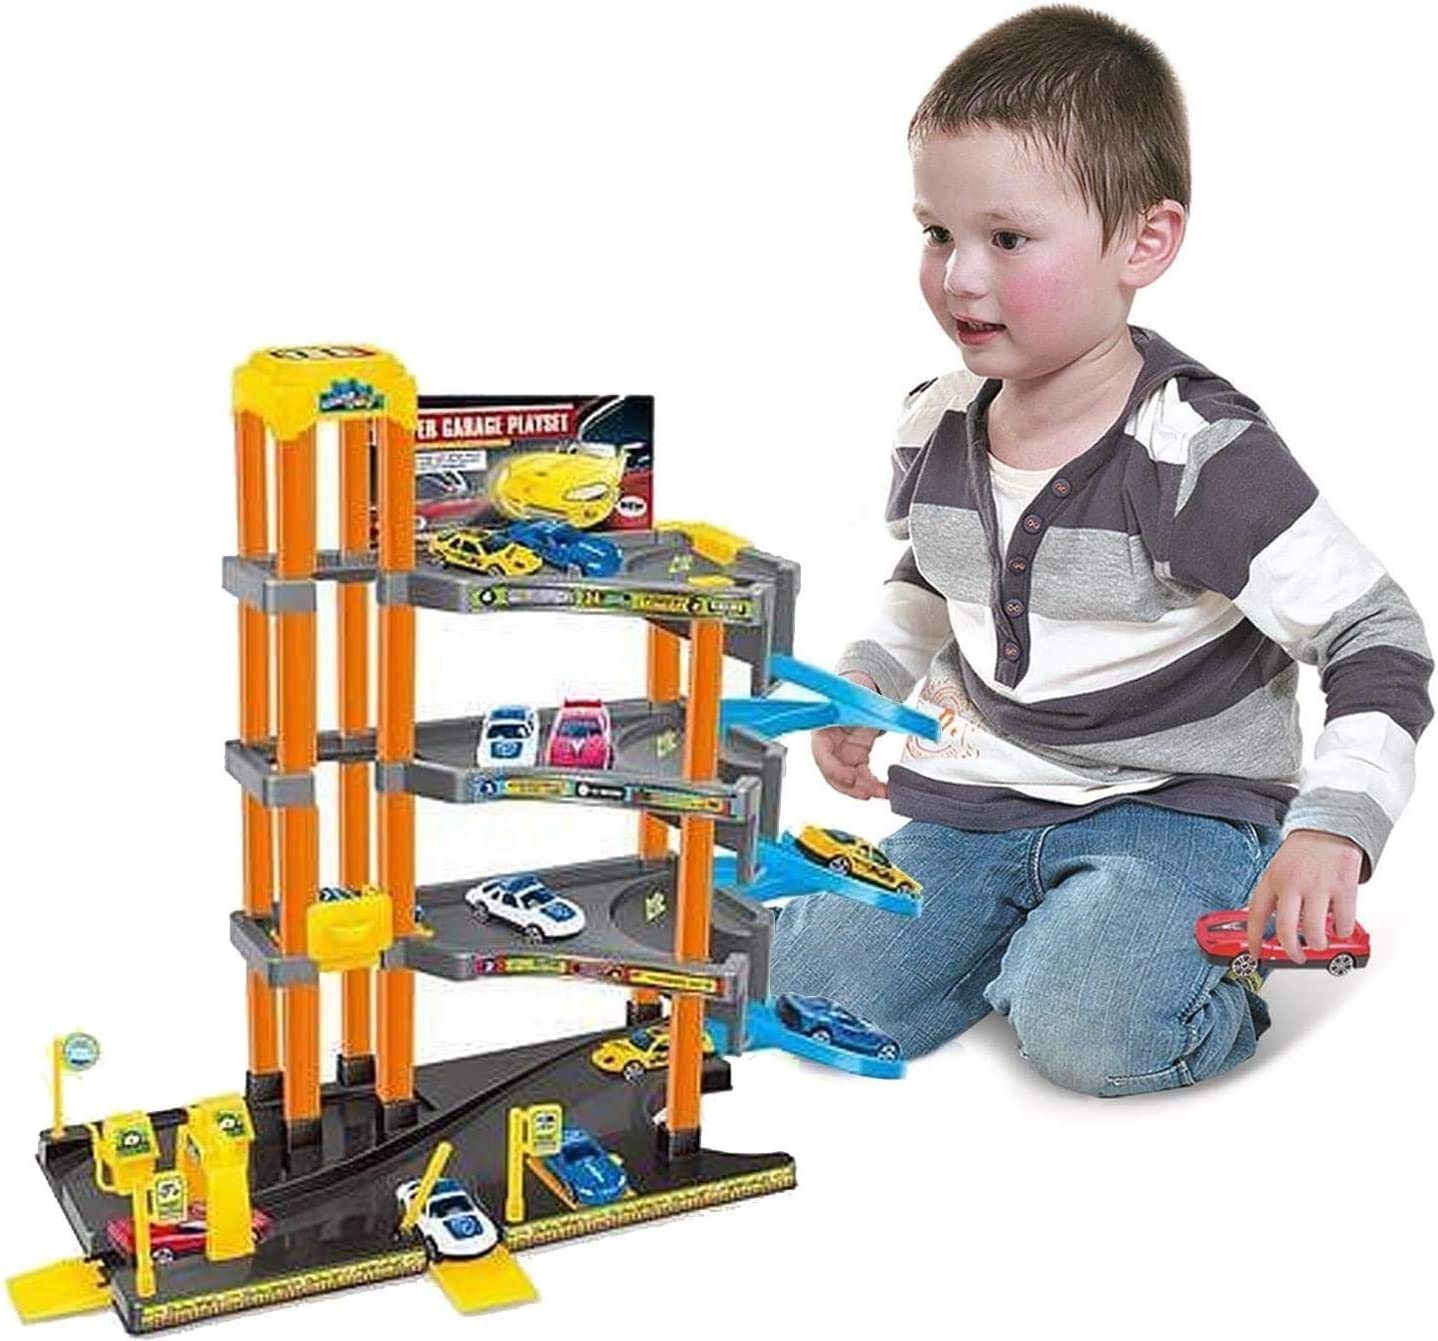 Spiral ramp Koolbitz Toy Garage Large 4 Storey Parking Garage Playset with Rotation lifting function Gas station And 4 car